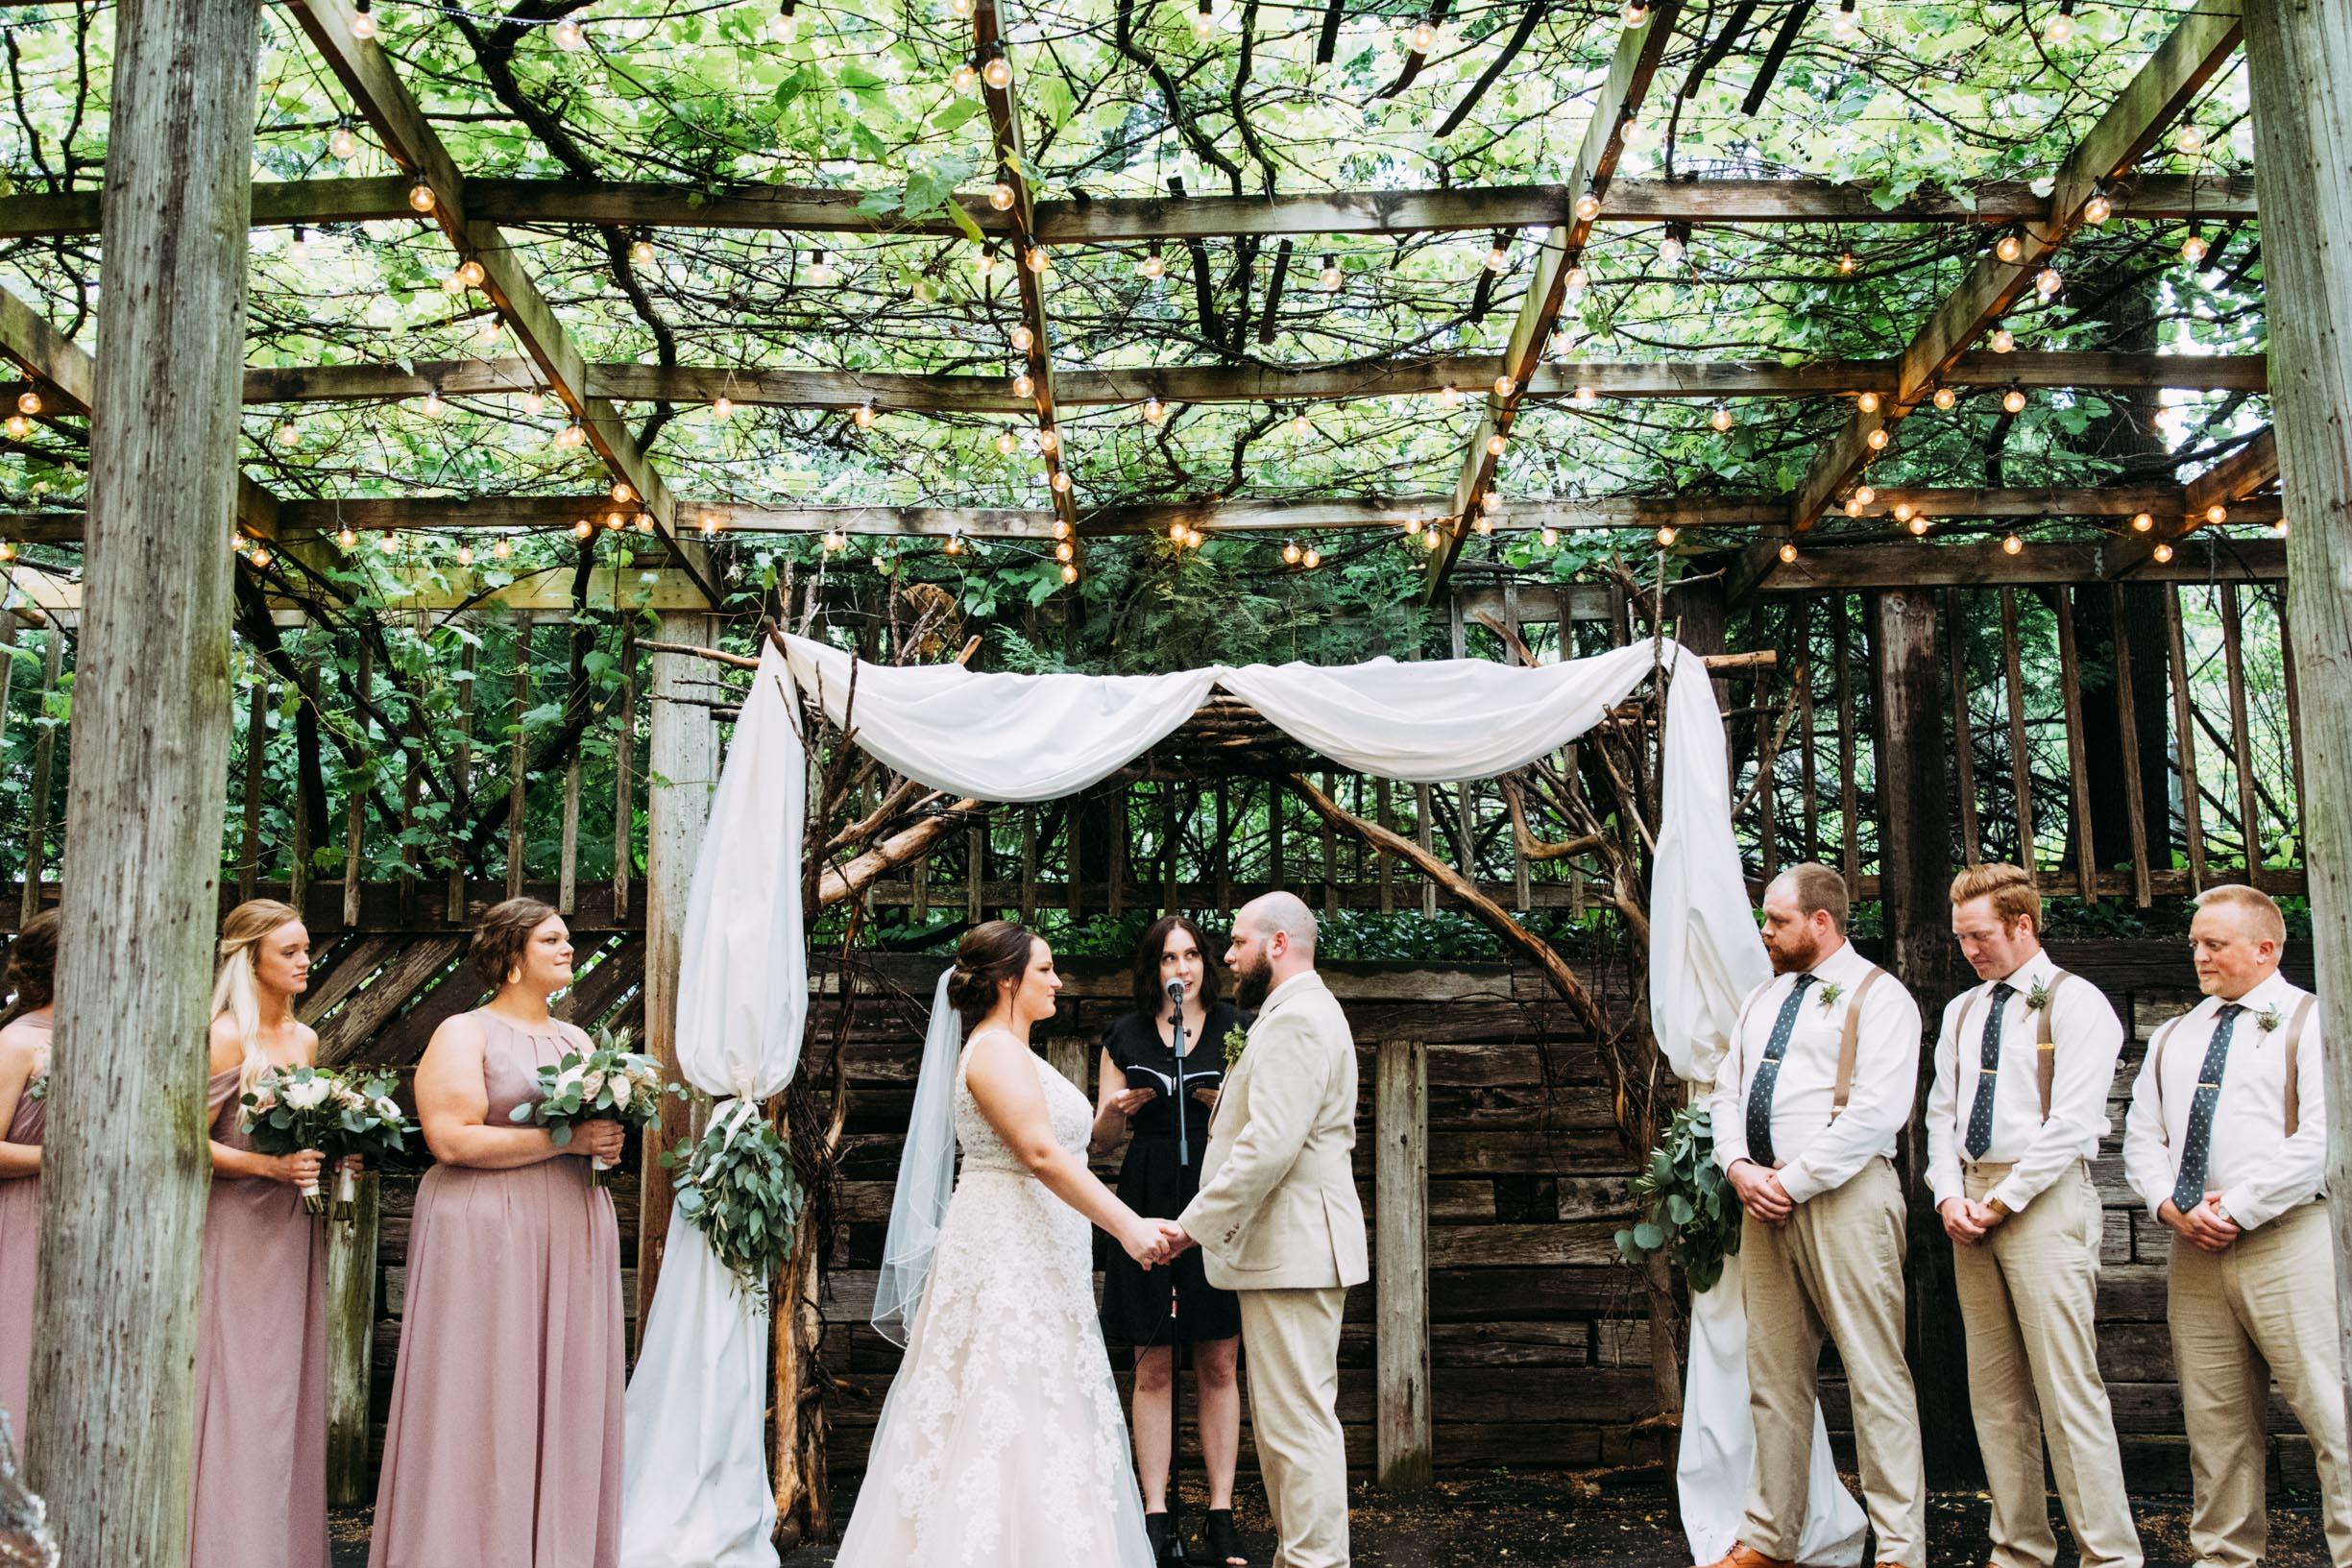 44-Jess_Jeremy_Minnesota_Wedding_Ceremony.jpg